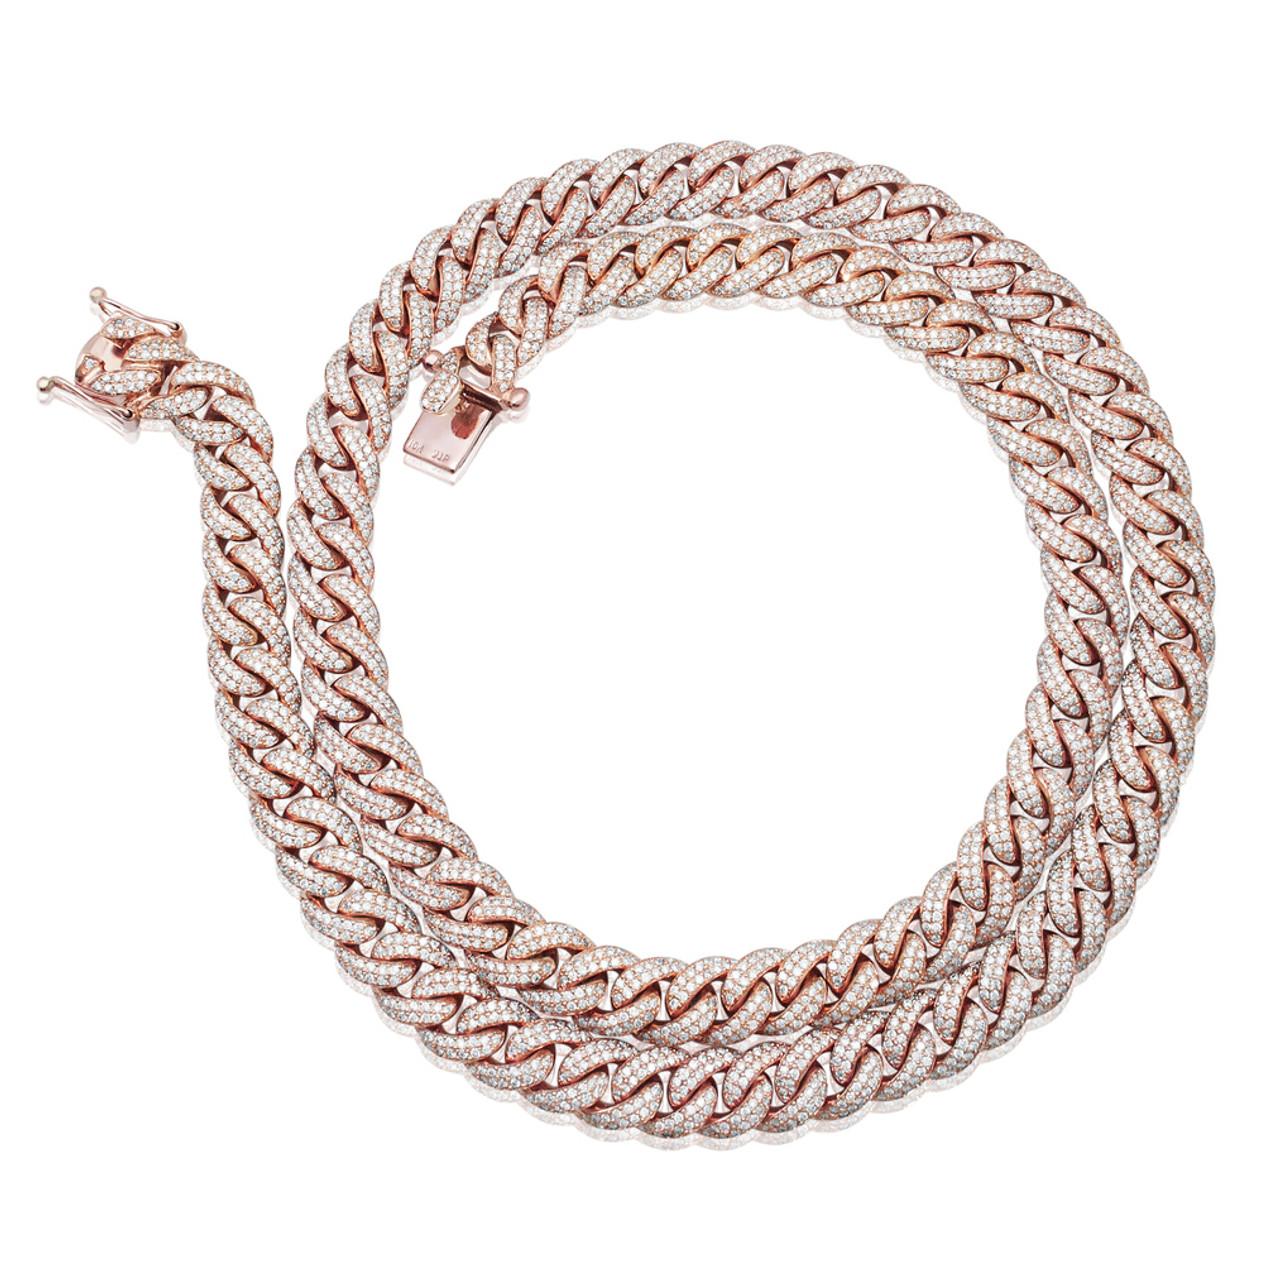 10k Gold Cuban Link Chain >> 10k Rose Gold 30ct Diamond 12mm Cuban Link Chain 30in